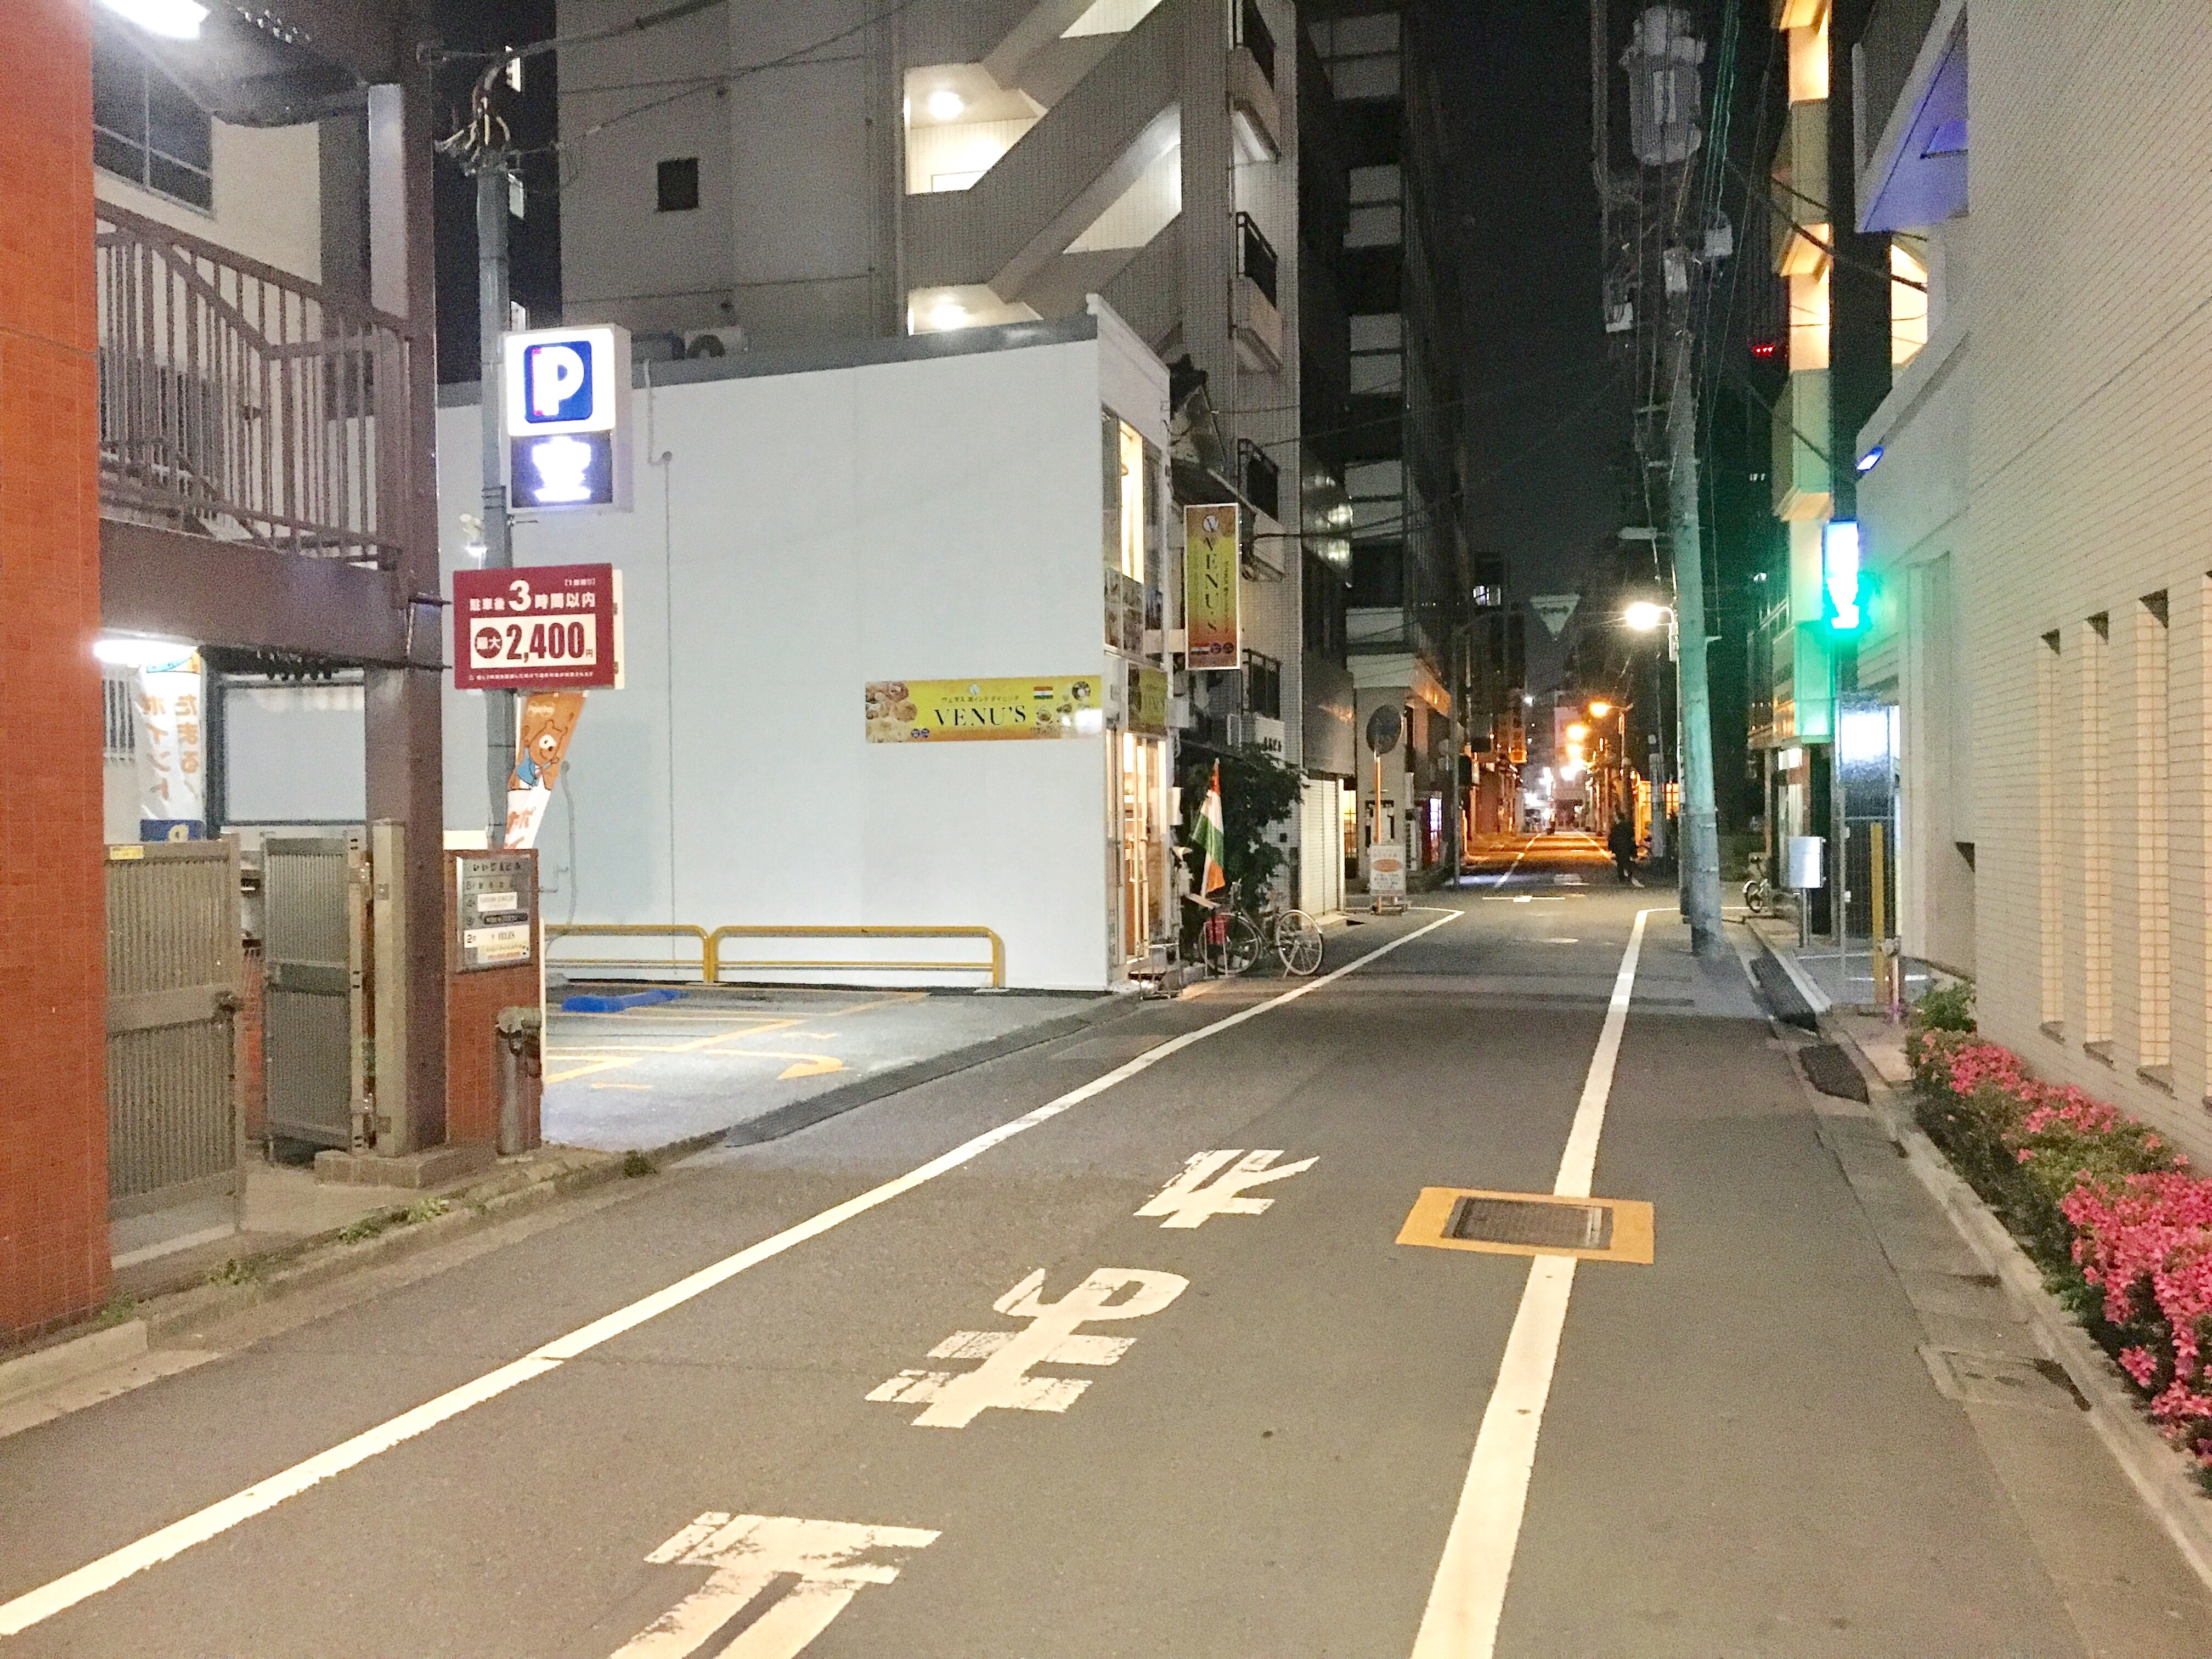 f:id:SoichiroIkeshita:20170606155714j:image